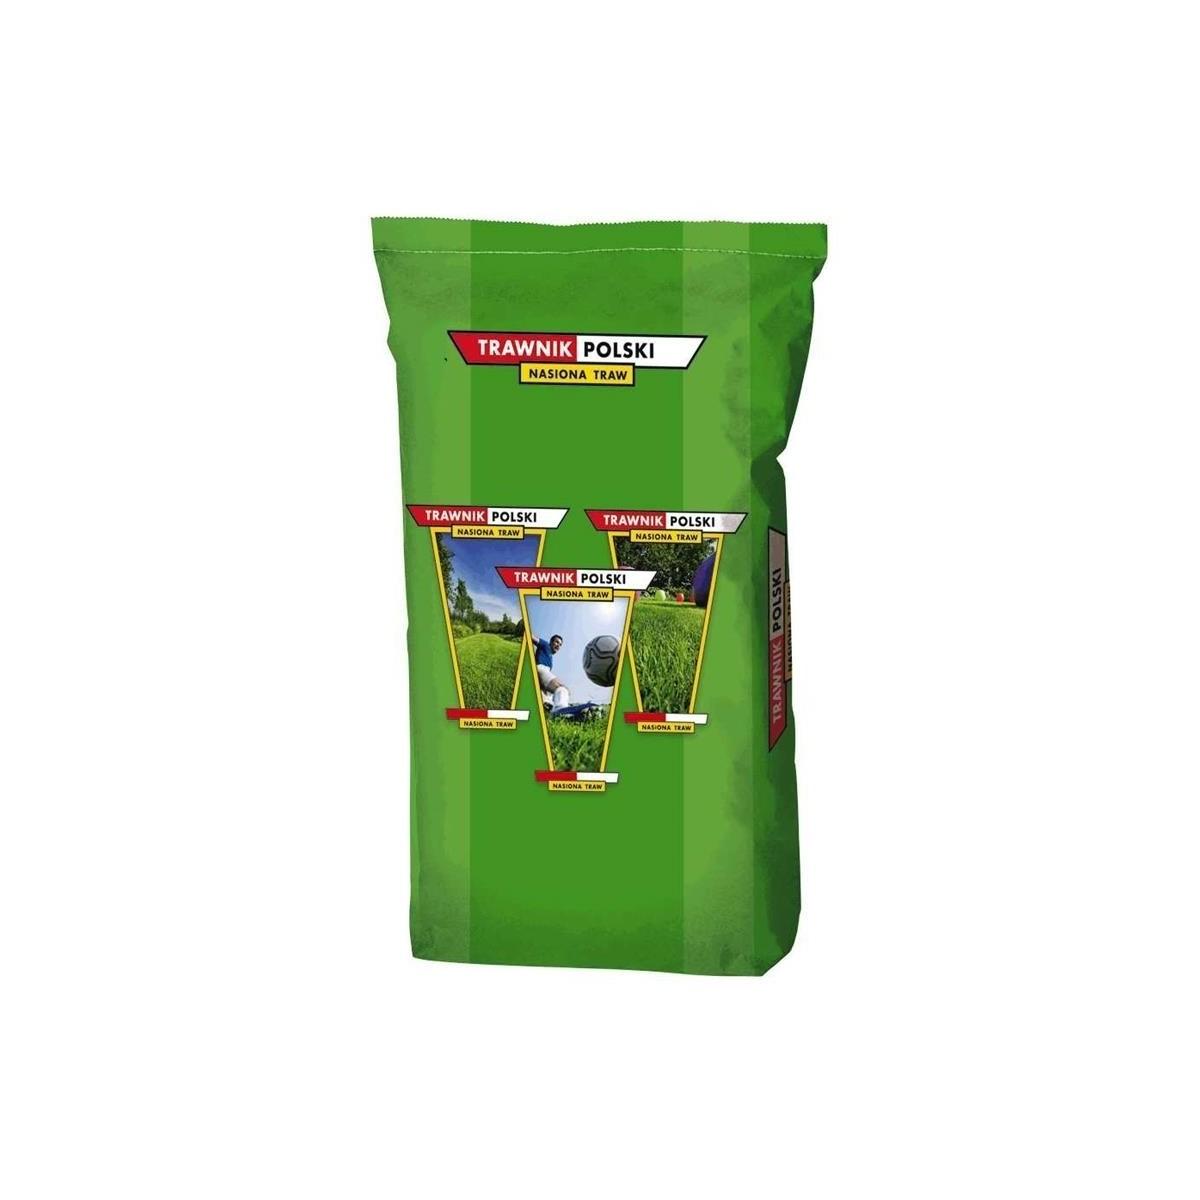 Nasiona Traw Trawnik Polski Desert 5kg